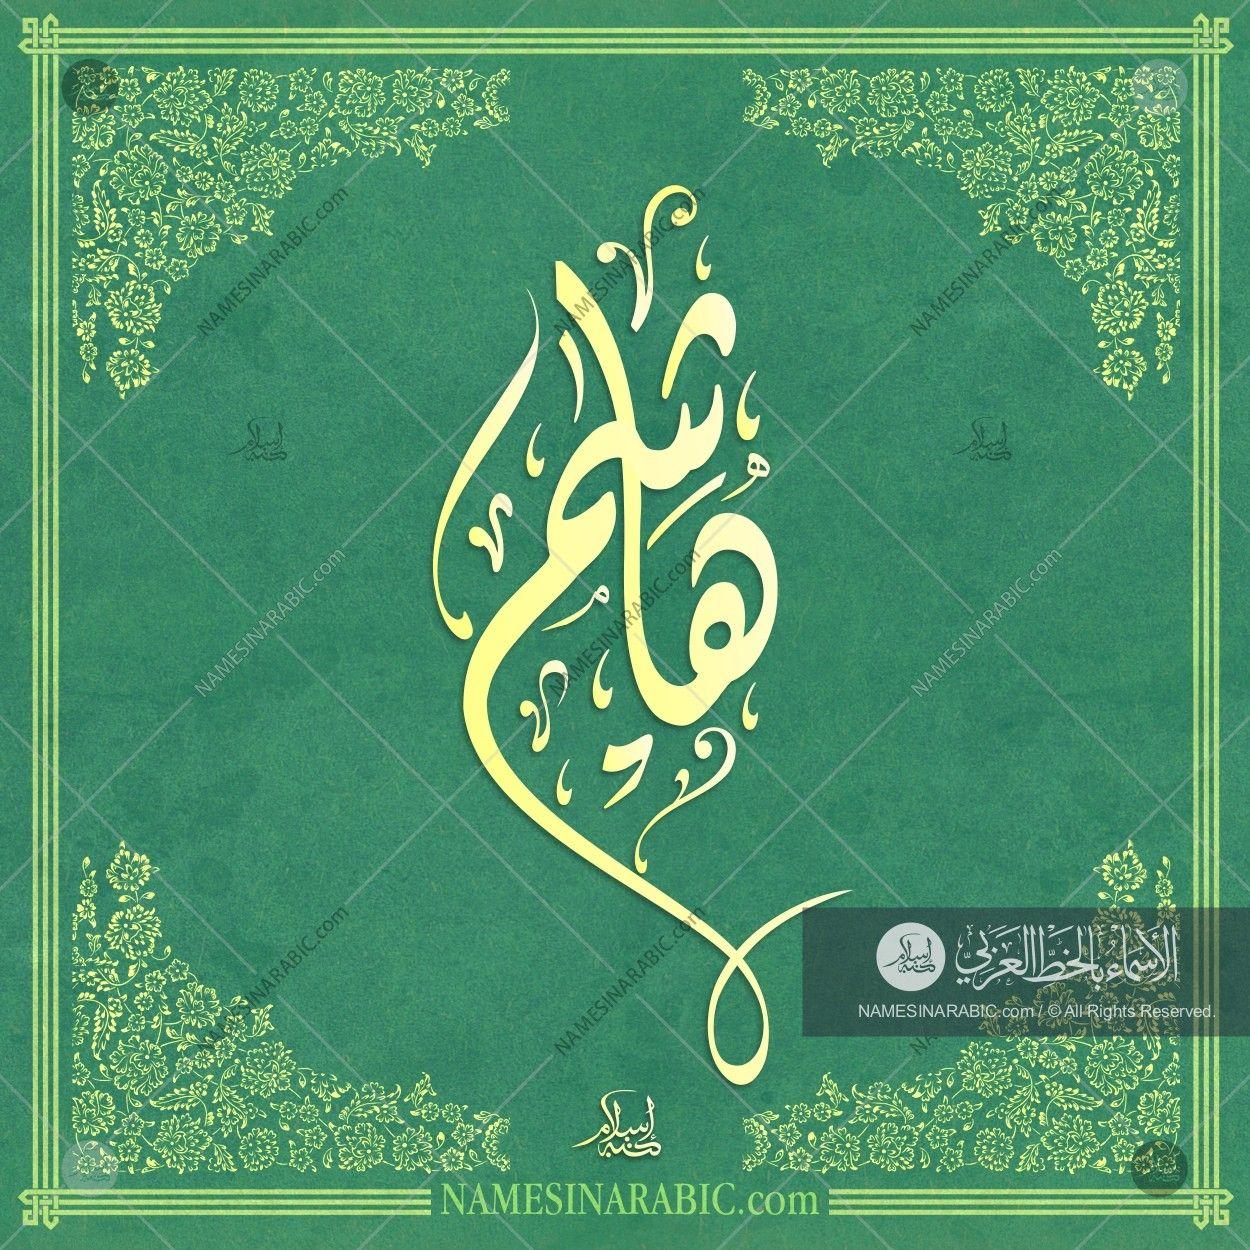 Hashim هاشم Names In Arabic Calligraphy Name 6105 Calligraphy Arabic Islamic Calligraphy